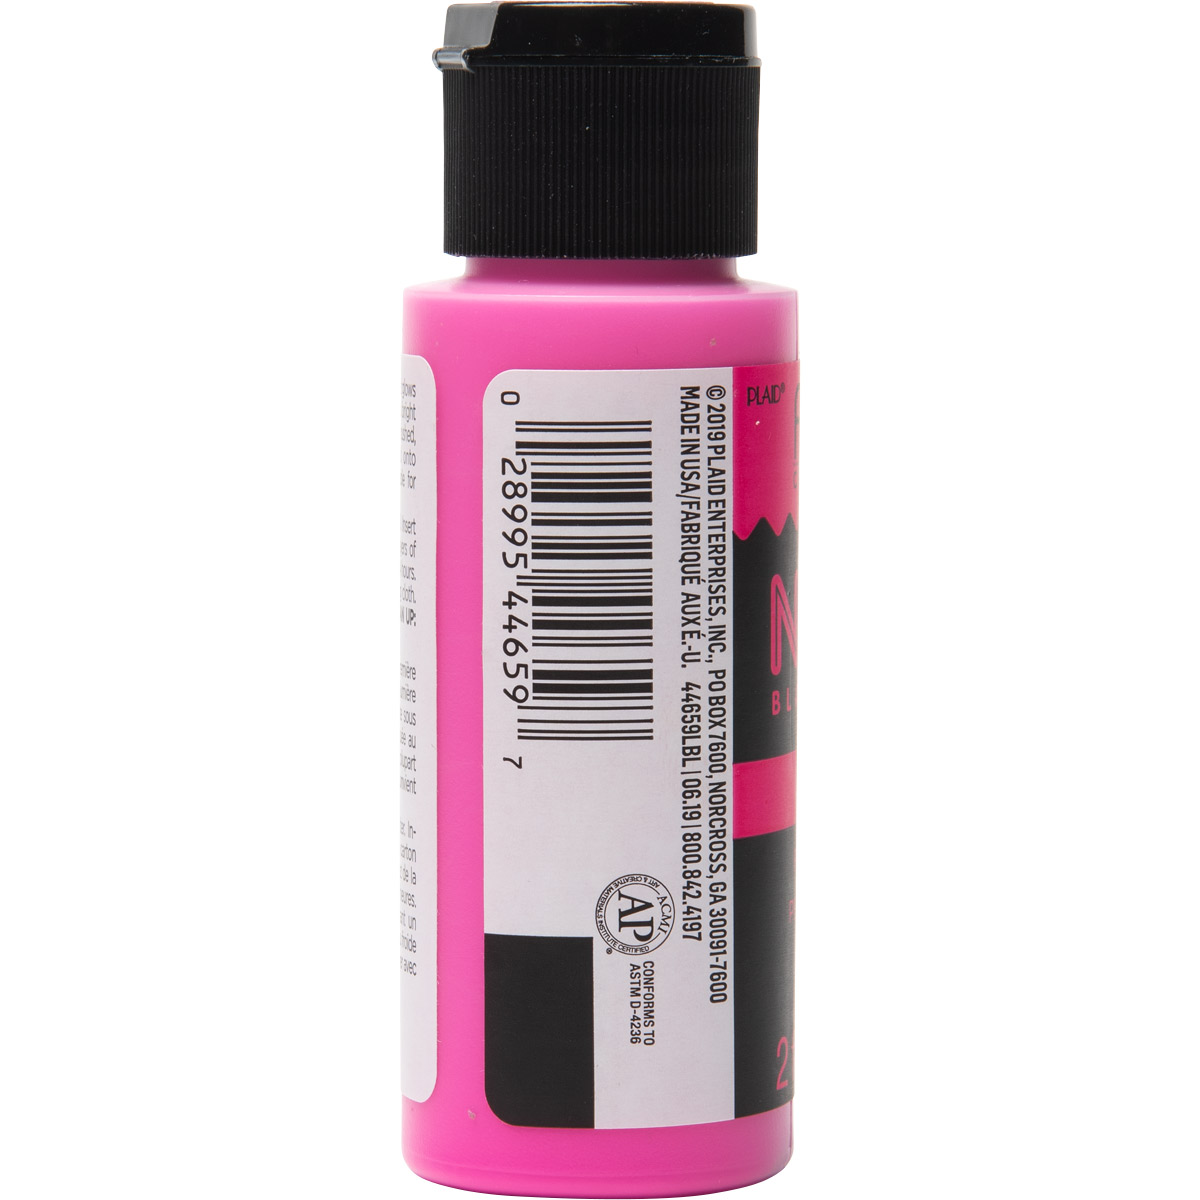 Fabric Creations™ Neon Black Light Fabric Paint - Pink, 2 oz. - 44659